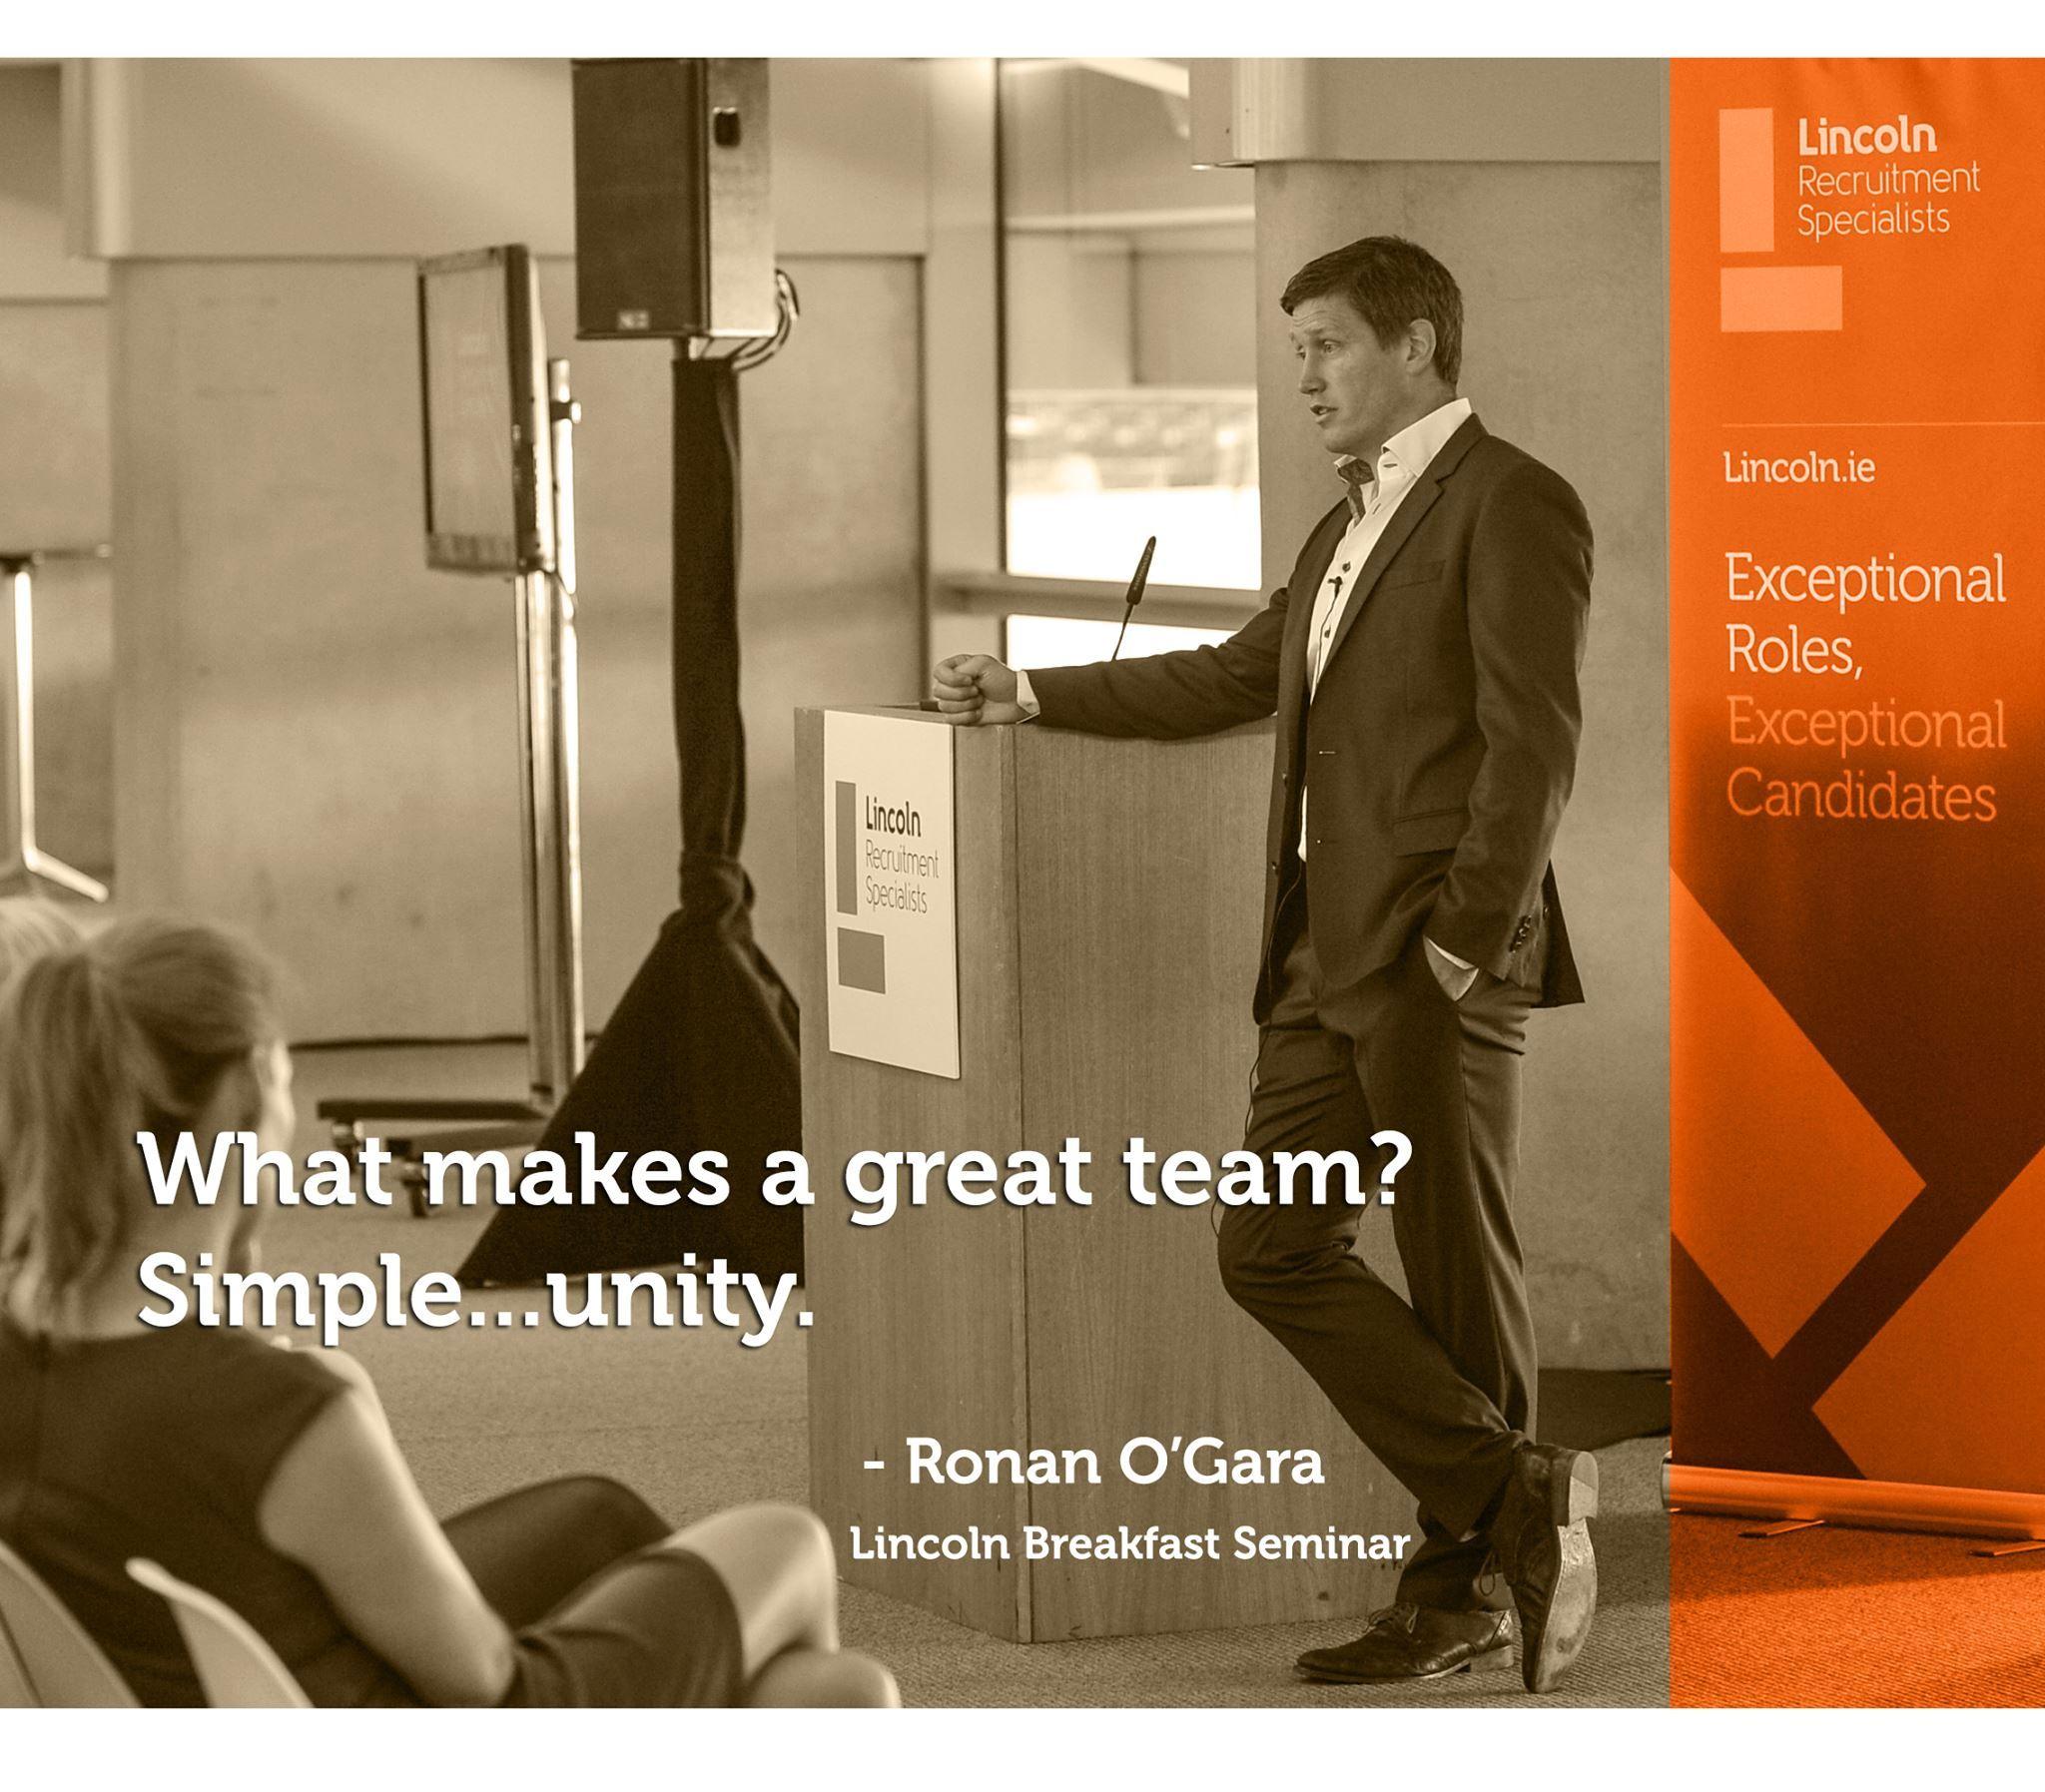 Ronan O Gara, Teamwork Quote motivational speaking Ronan O